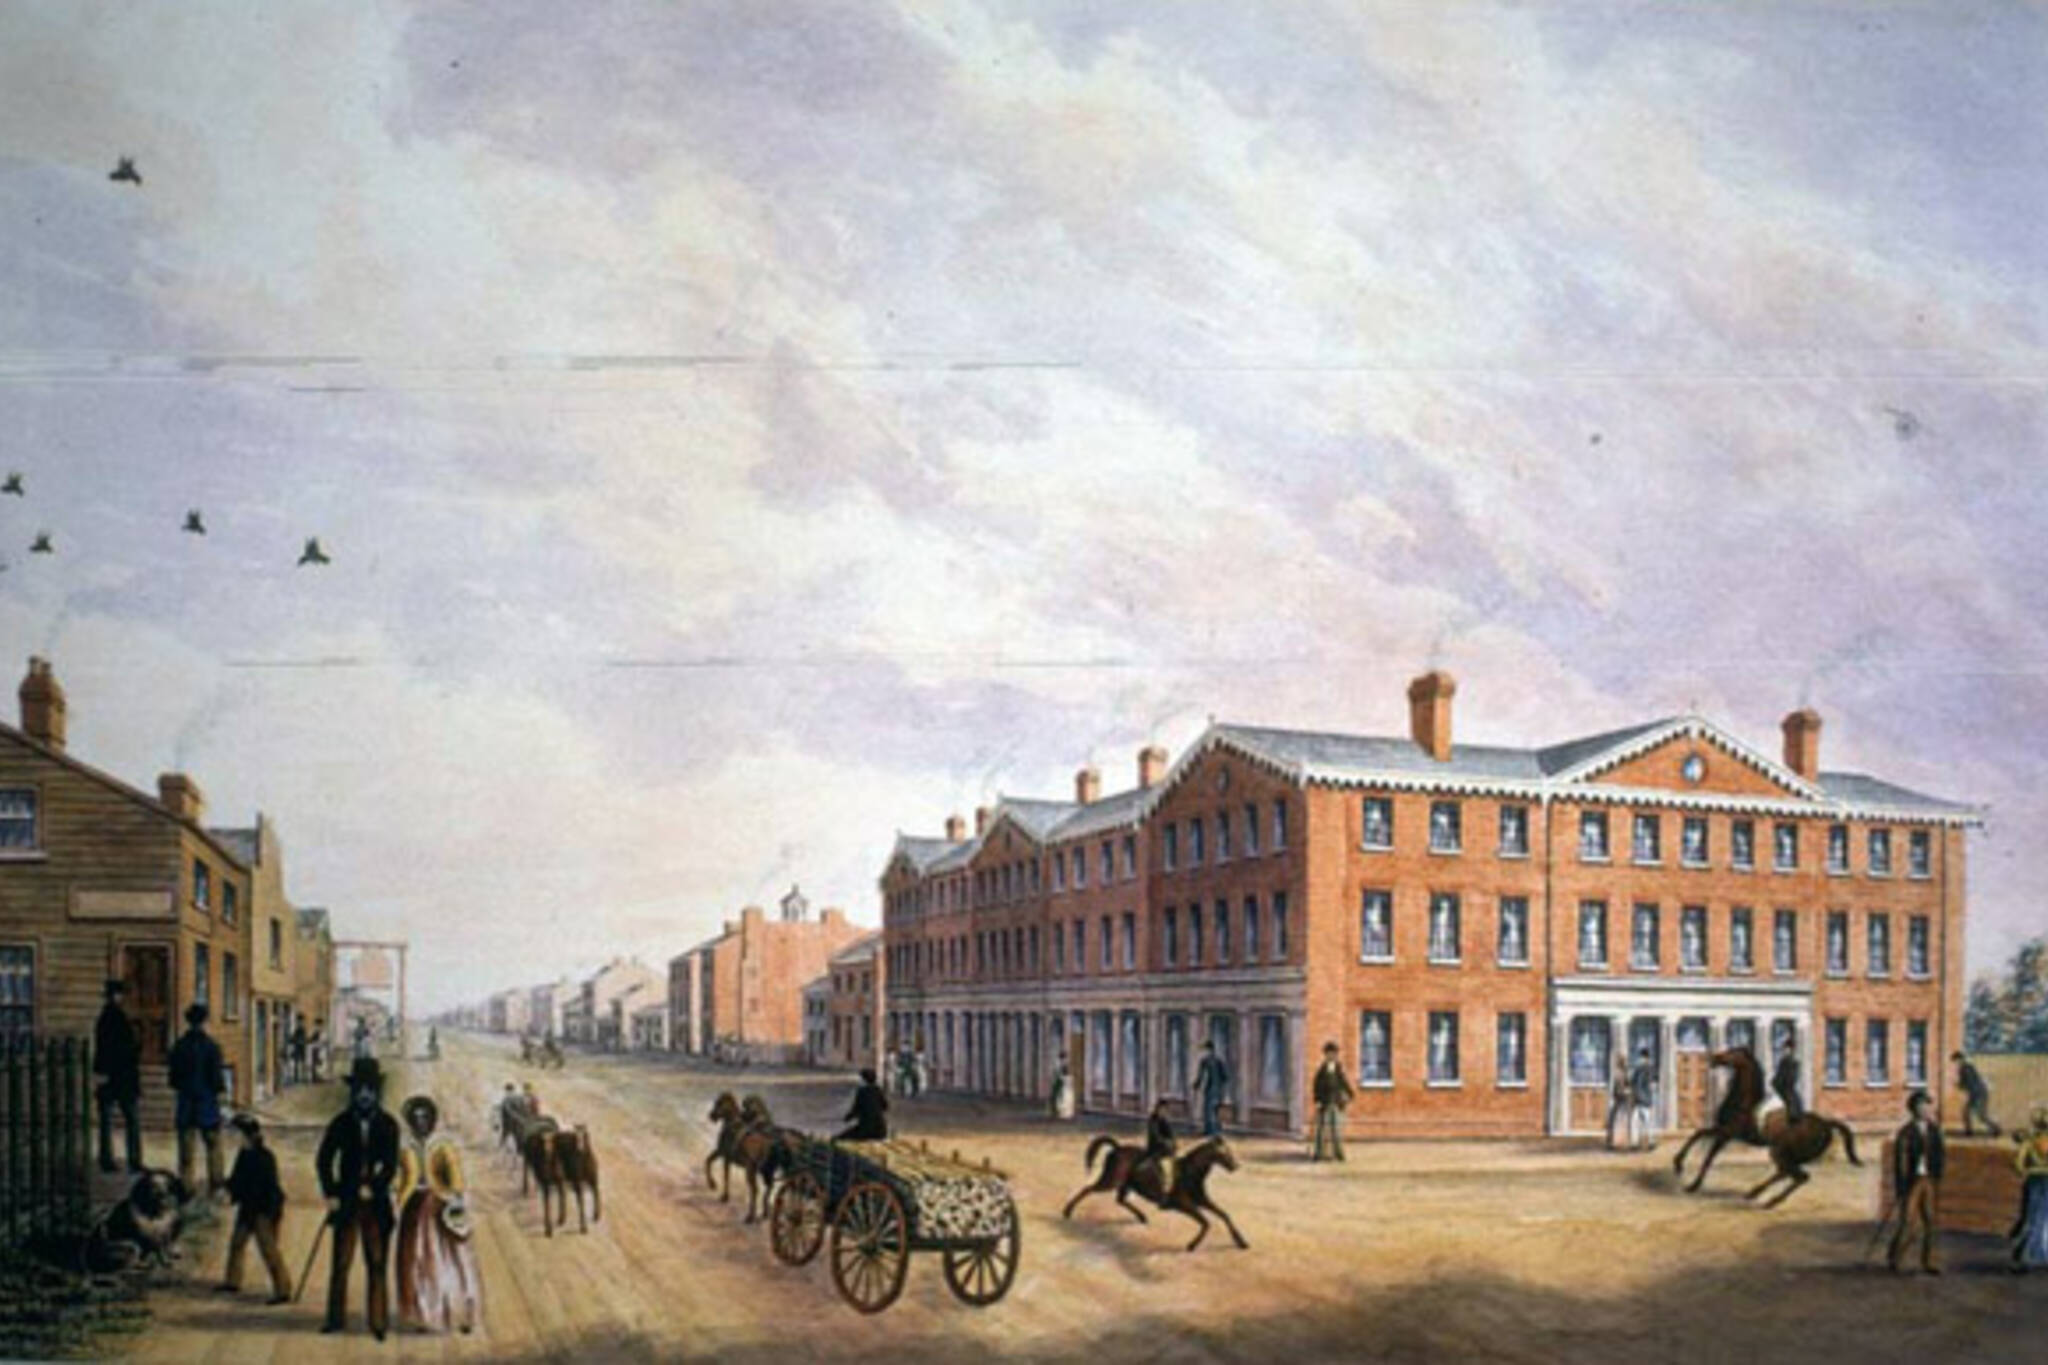 Toronto pre-1850s